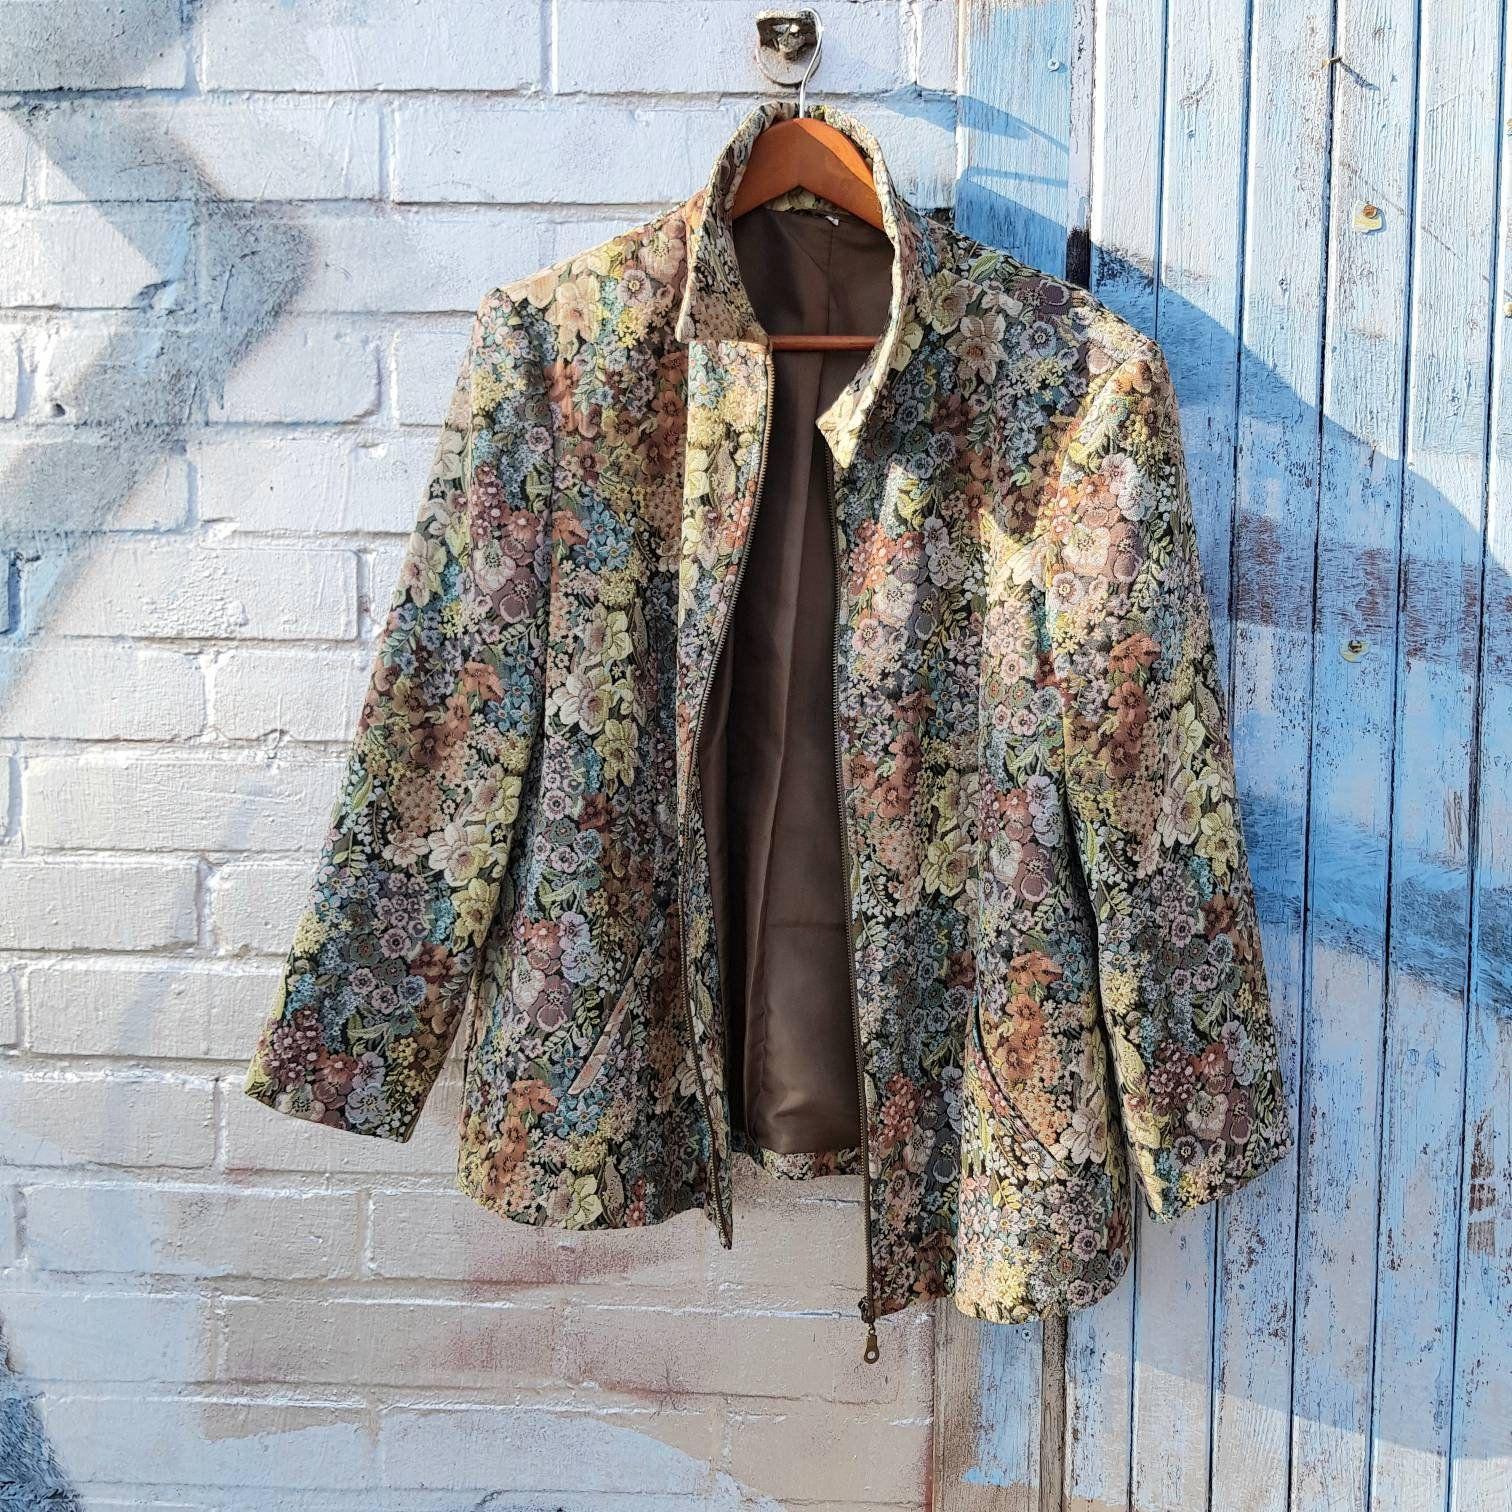 Vintage Flower Blazer 90s Jacket Black Jacket Pink Top Festival Style Boho Handmade